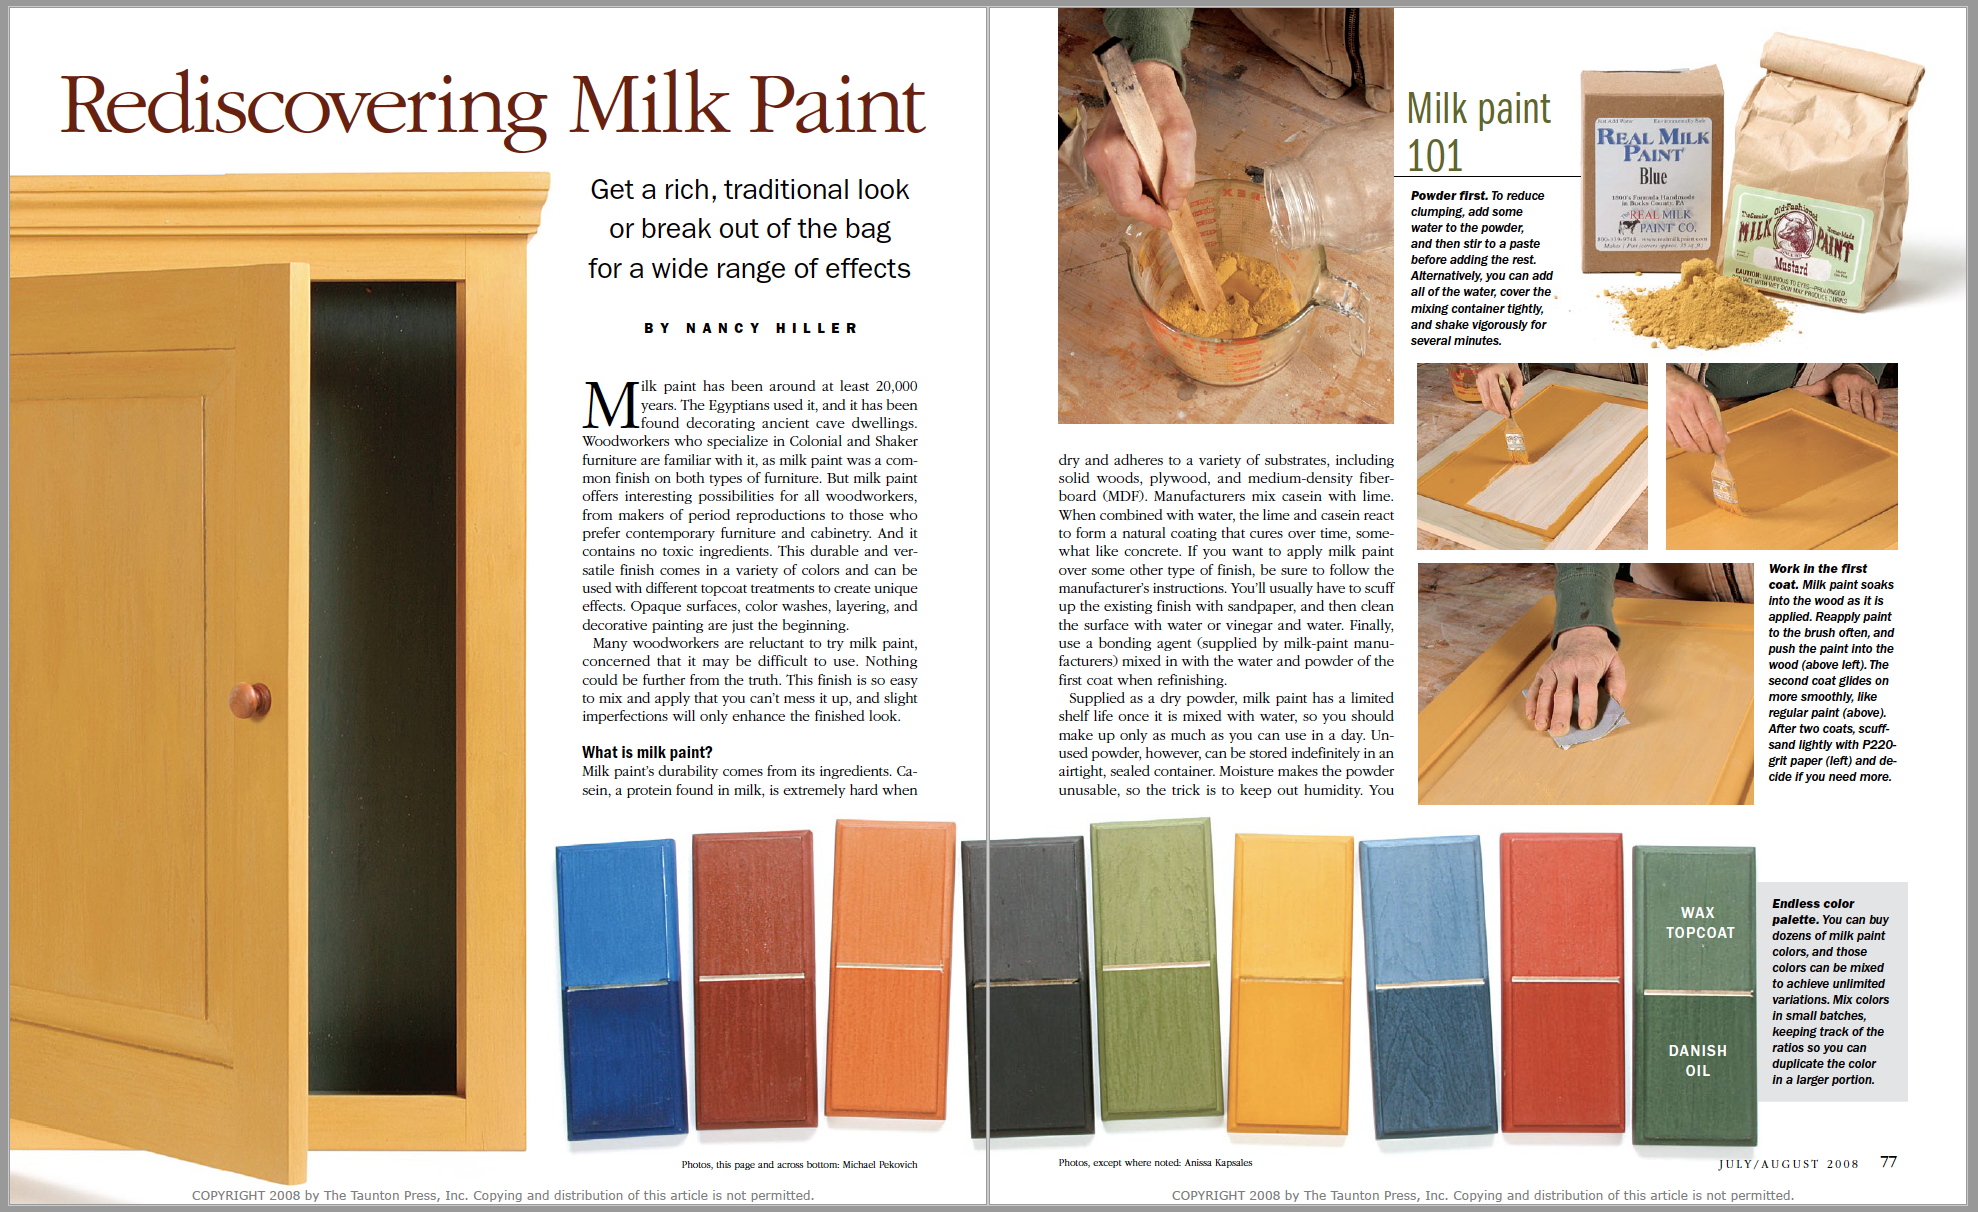 Rediscovering Milk Paint